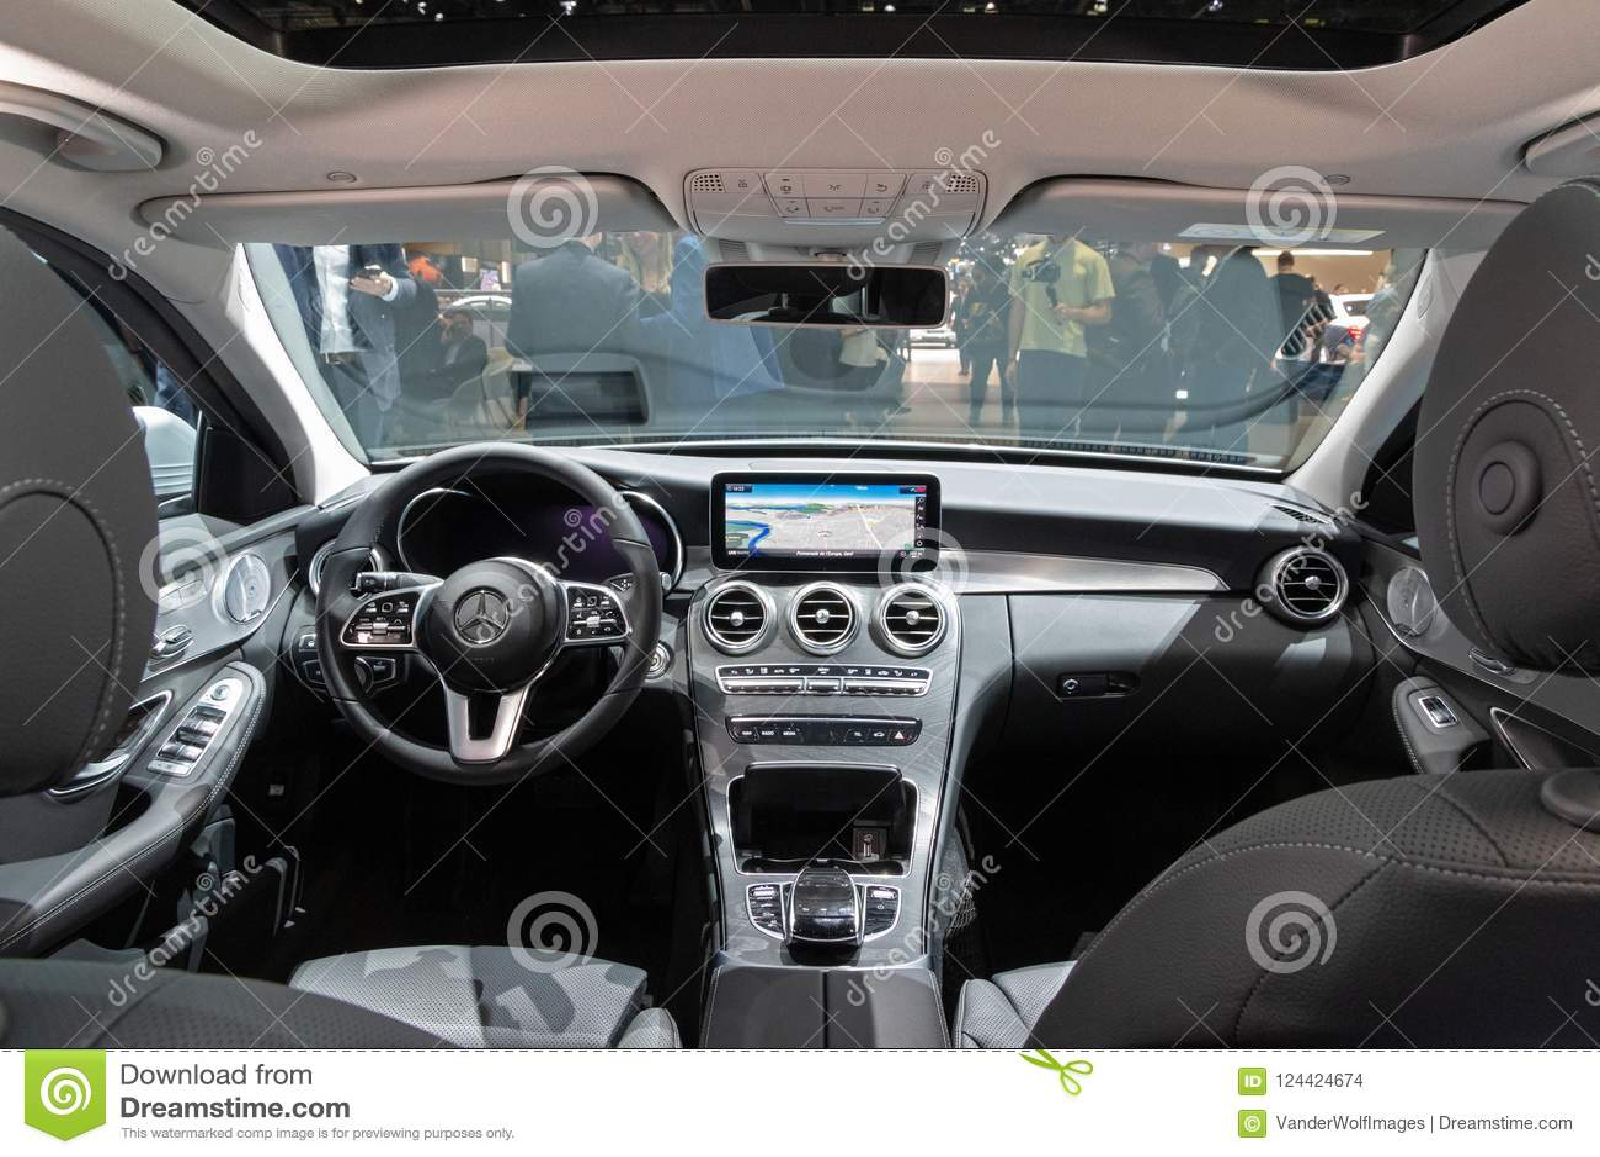 Mercedes Benz C-Class Hybrid car interior. Download preview